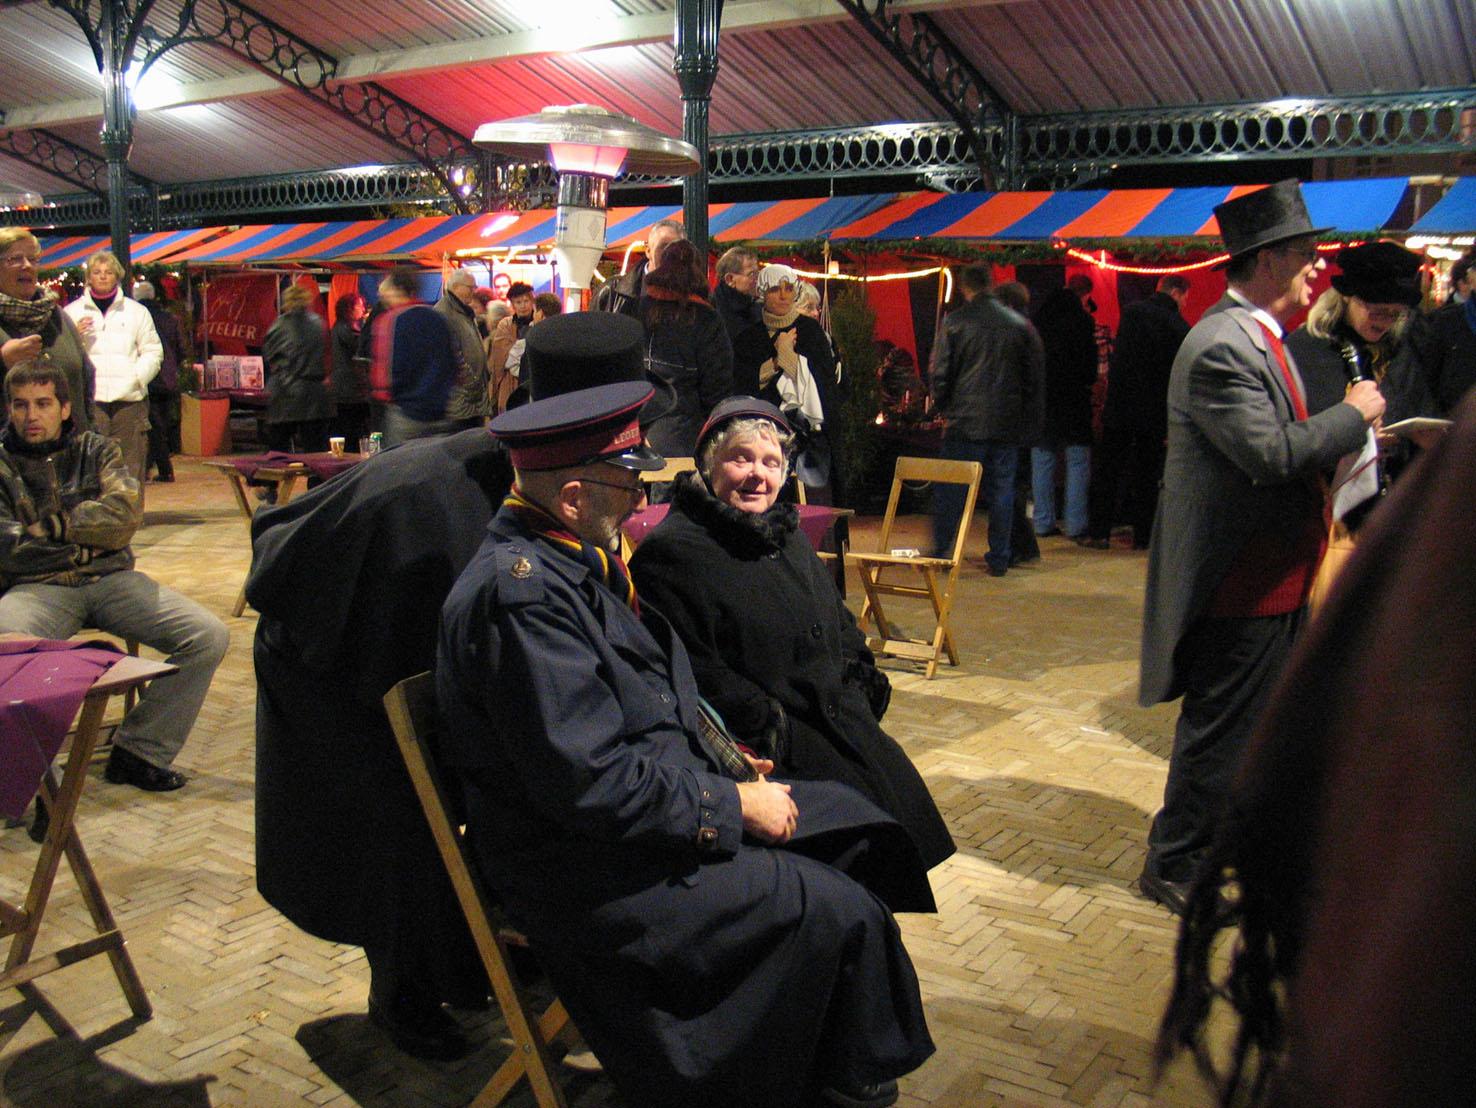 147 - Kerstmarkt Helmond 2003.jpg